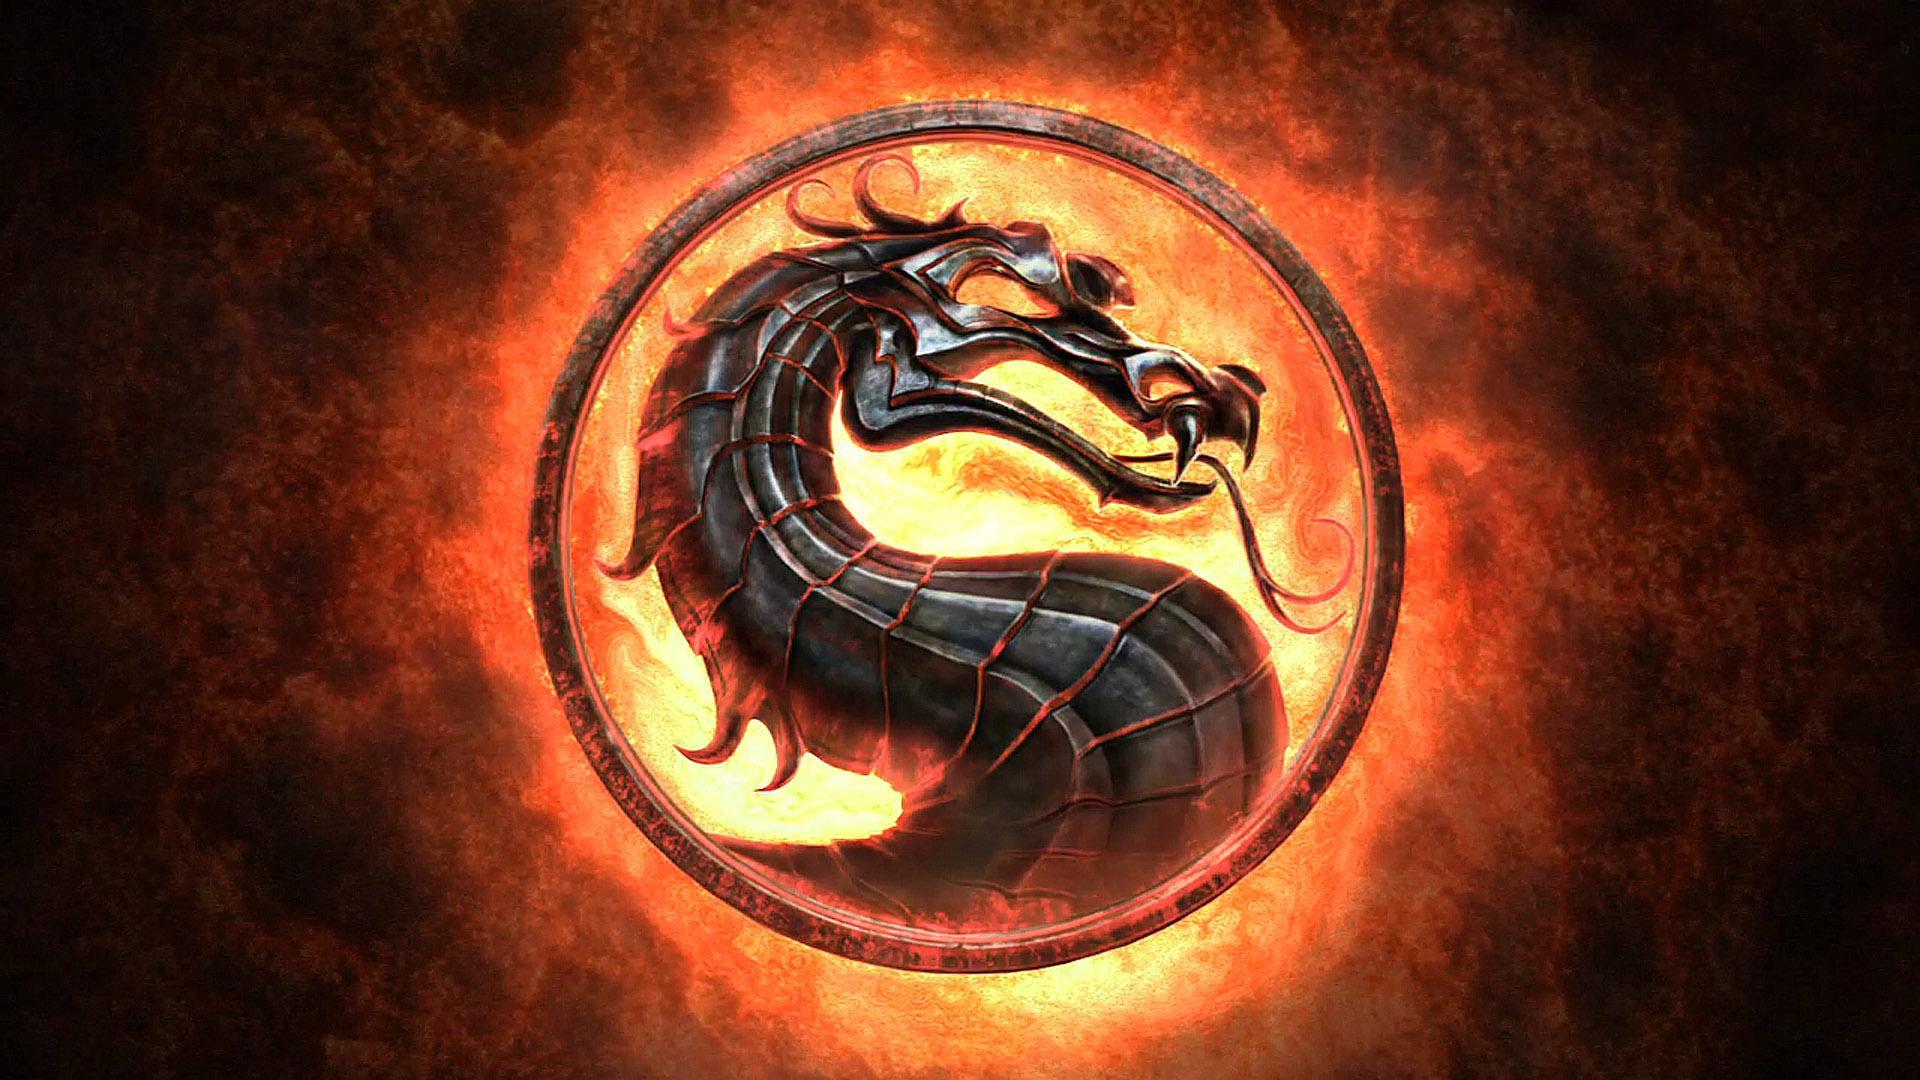 Mortal Kombat Logo Exclusive HD Wallpapers 4078 1920x1080